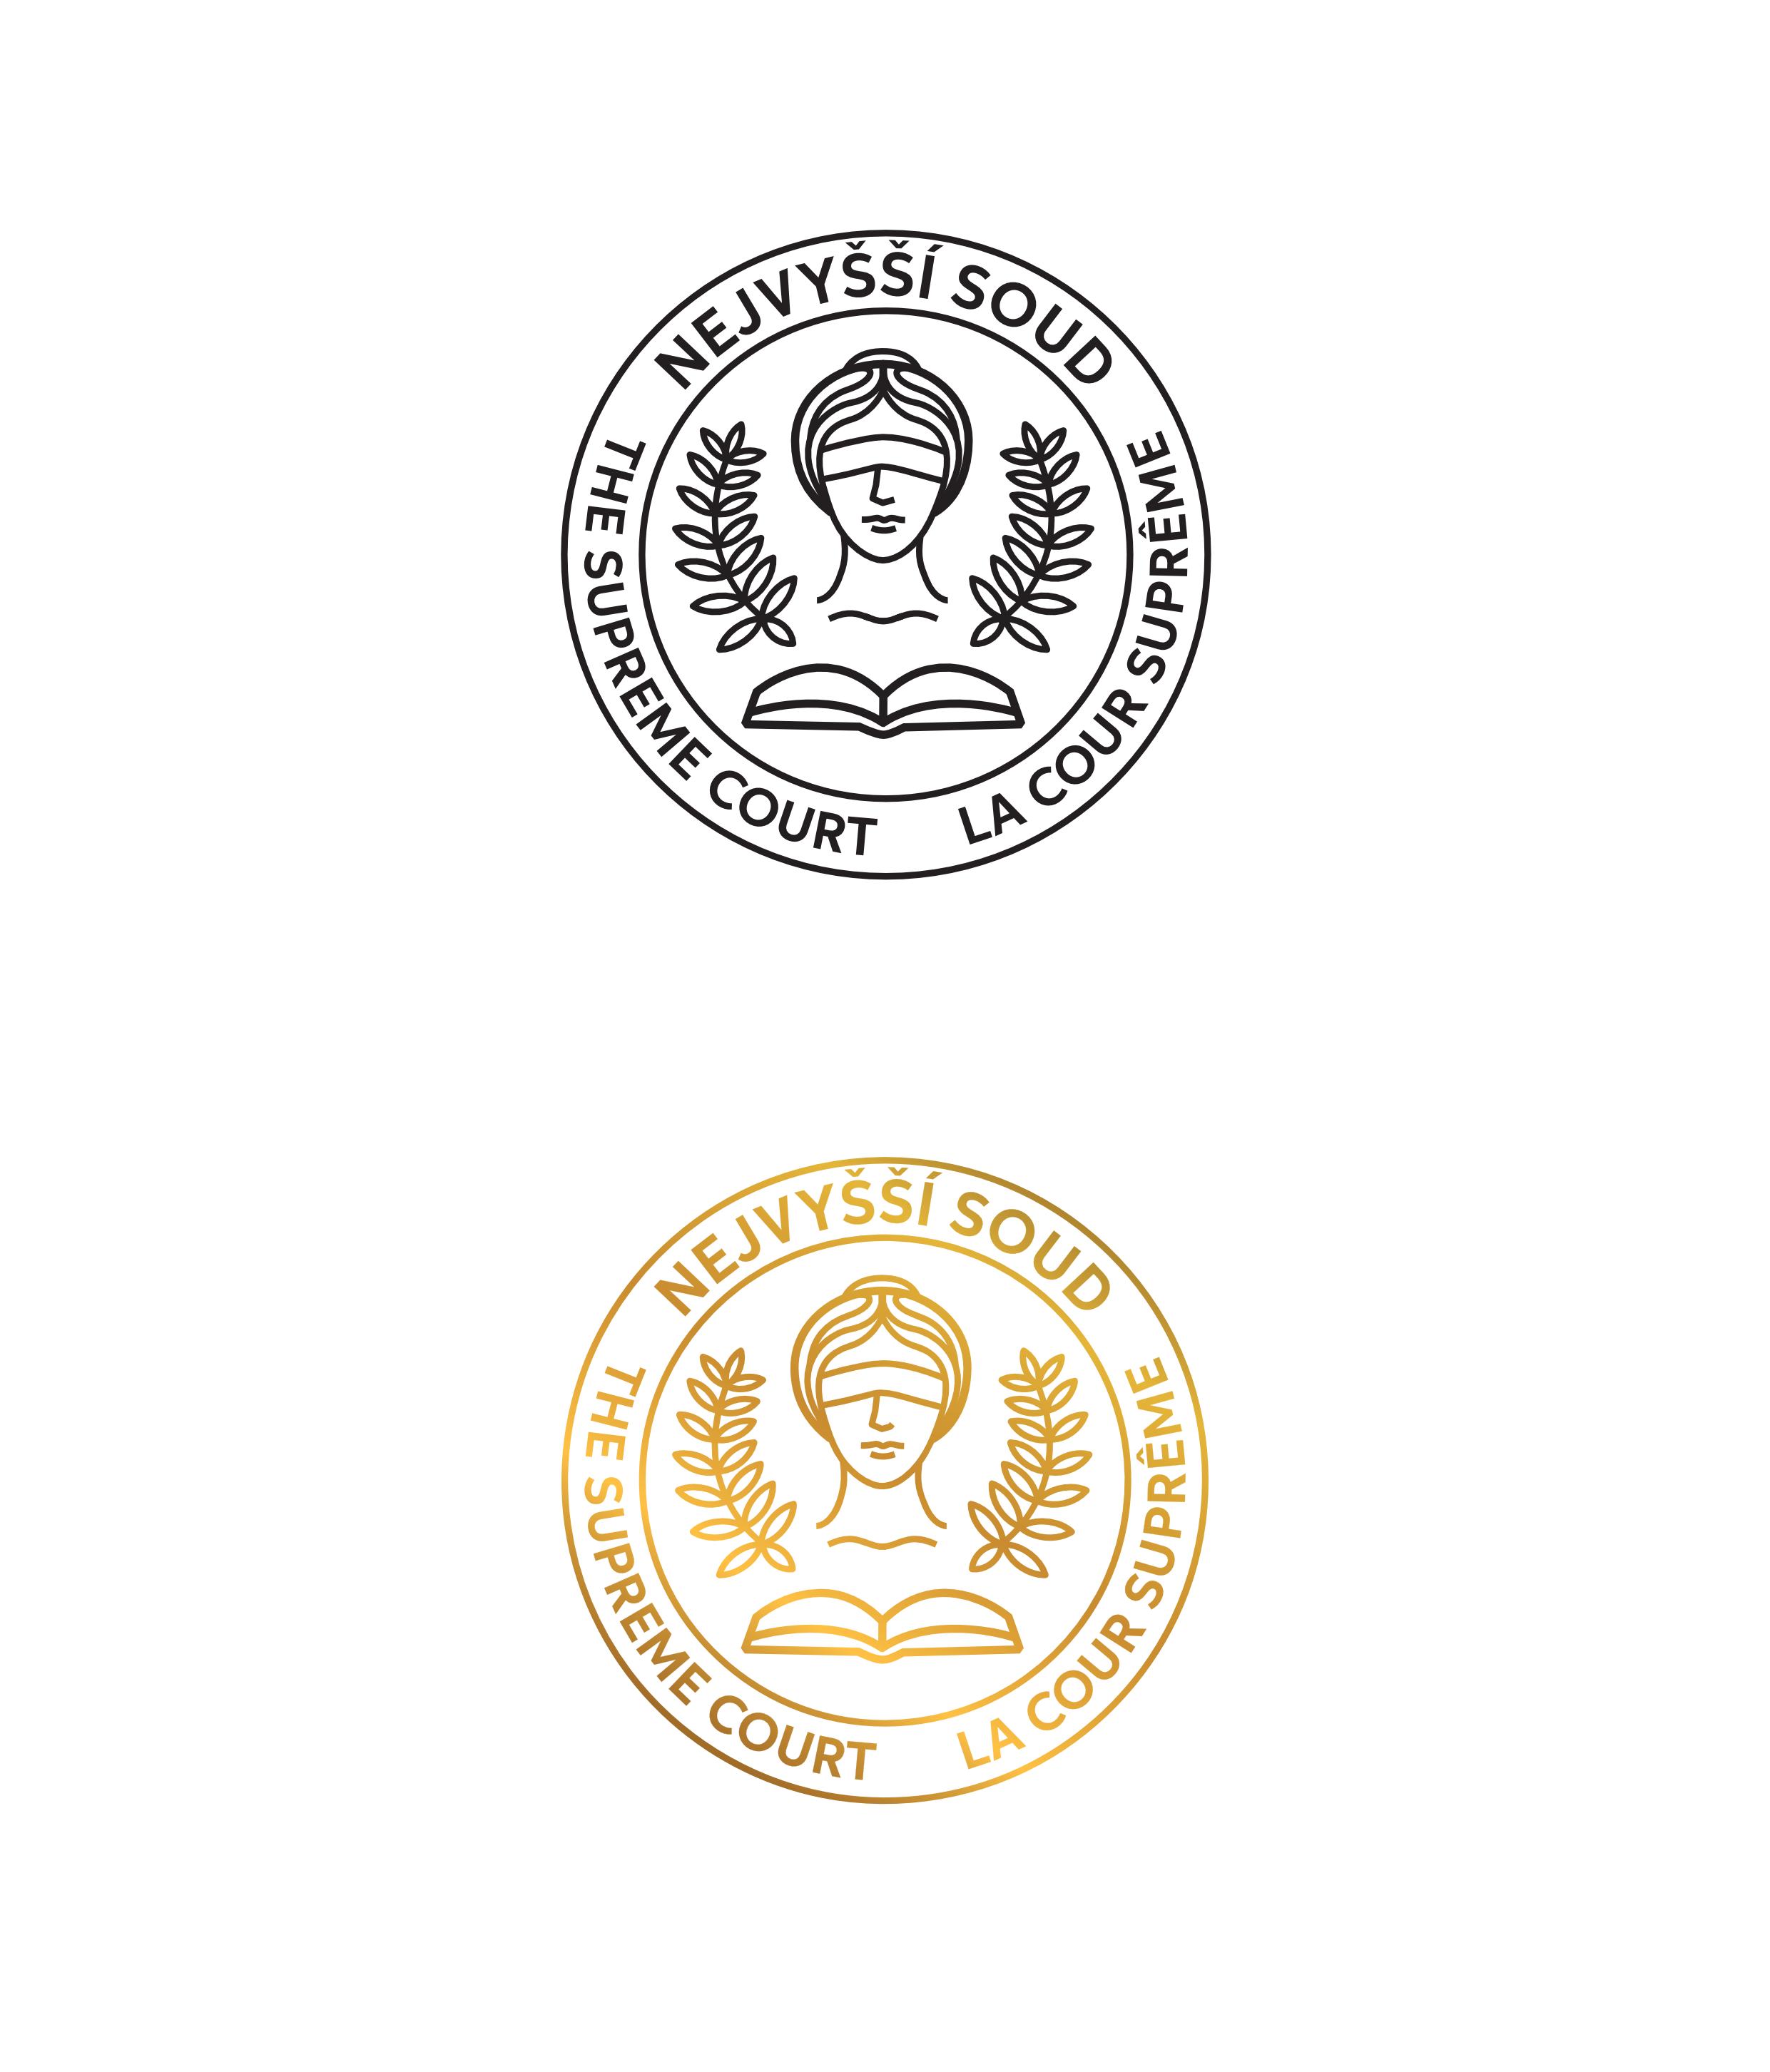 nsoud_logo_v04_003